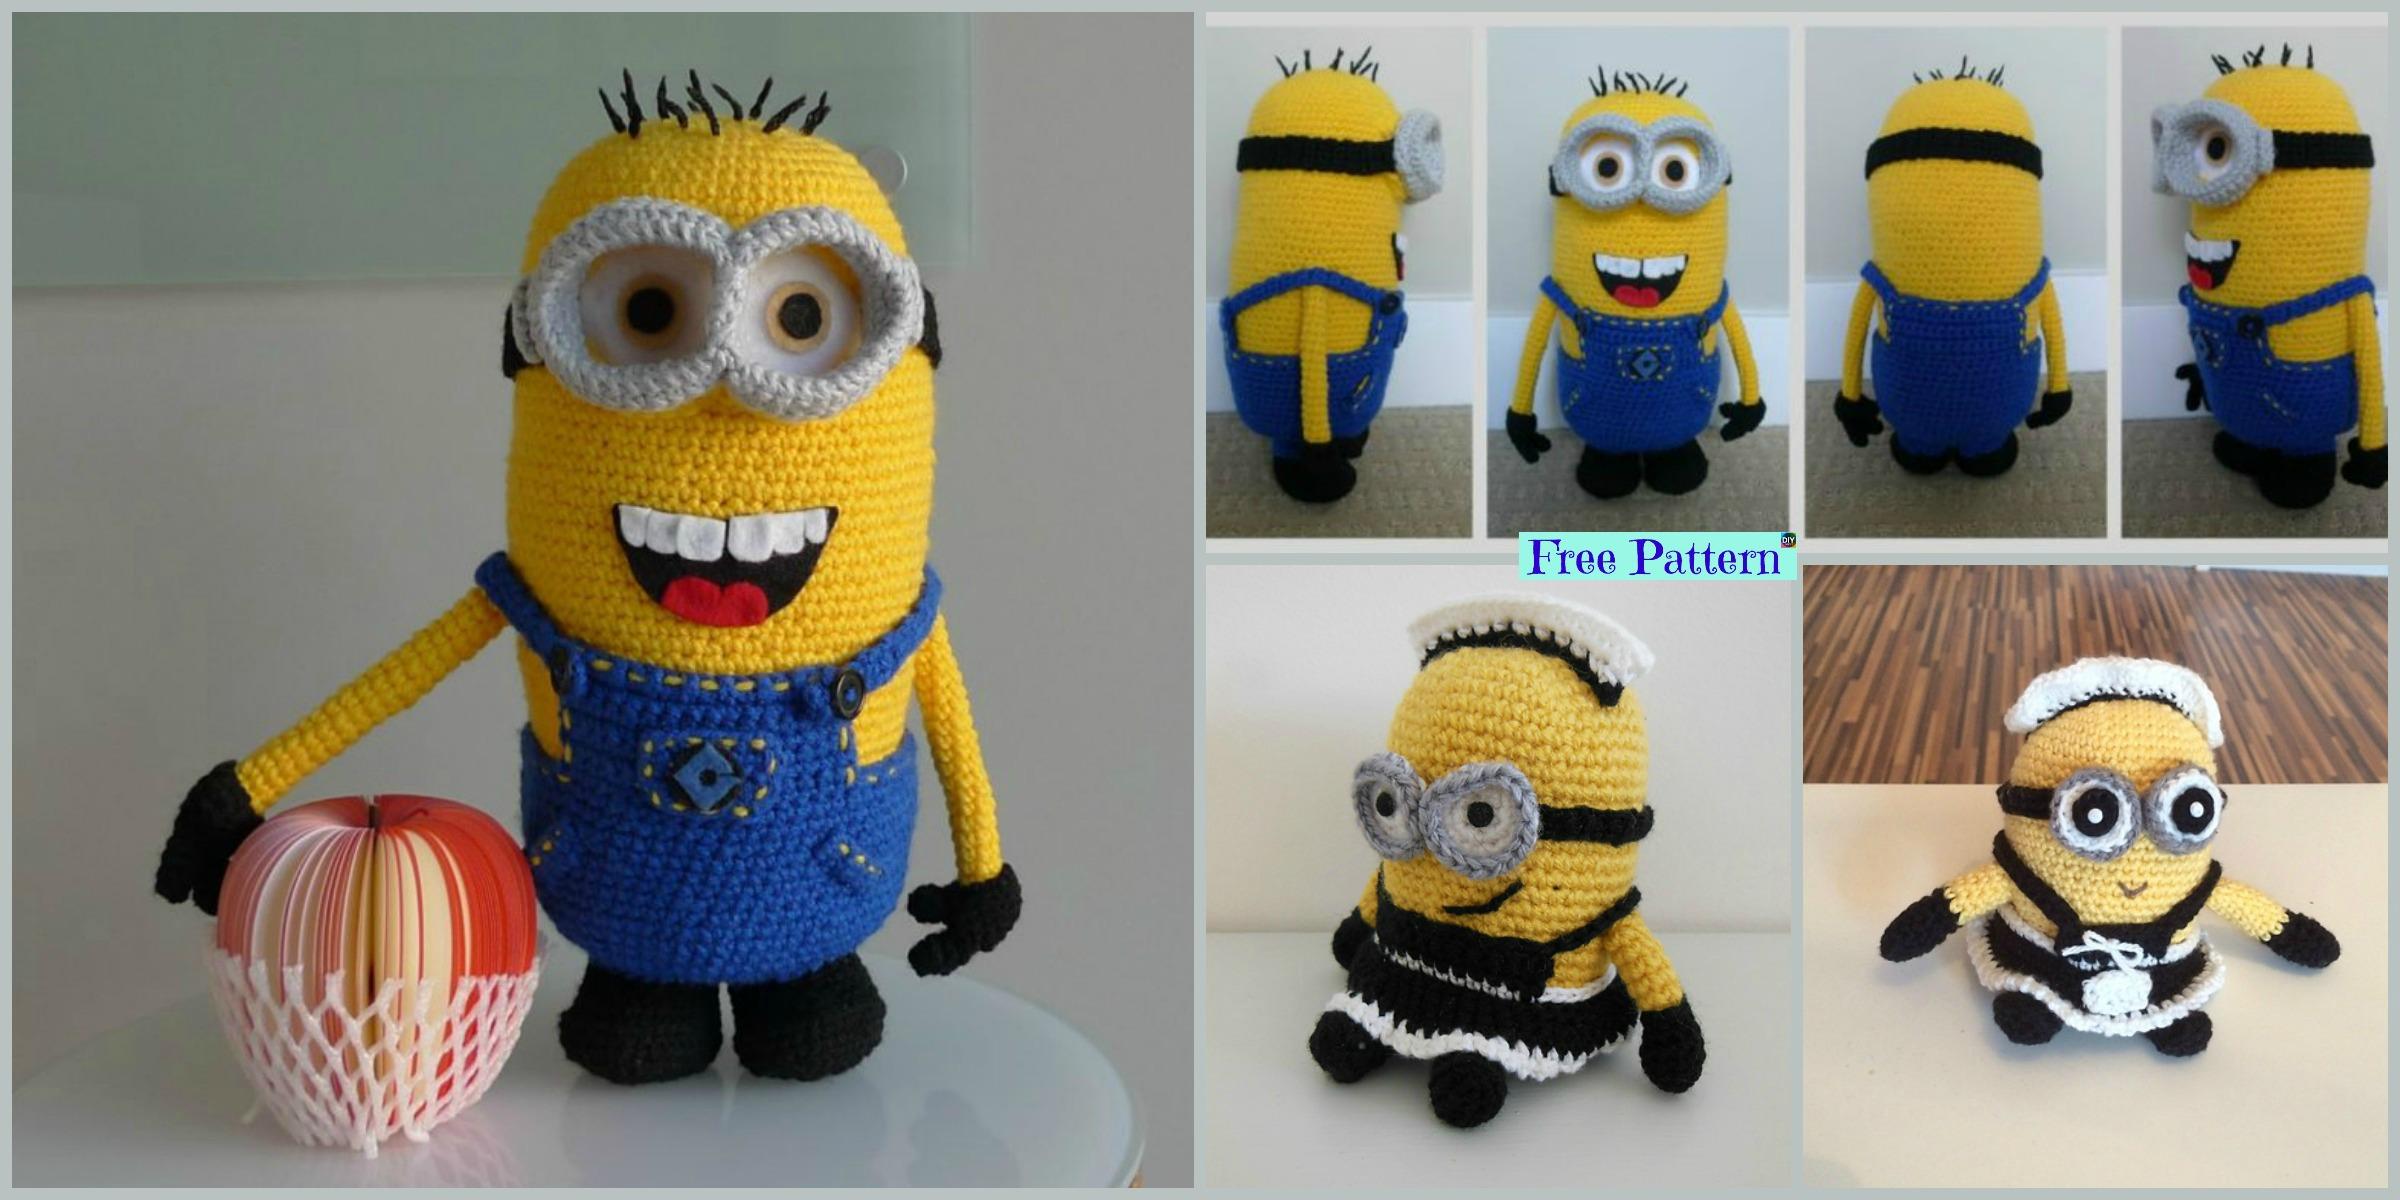 Super Cute Crochet Minion Character- Free Patterns